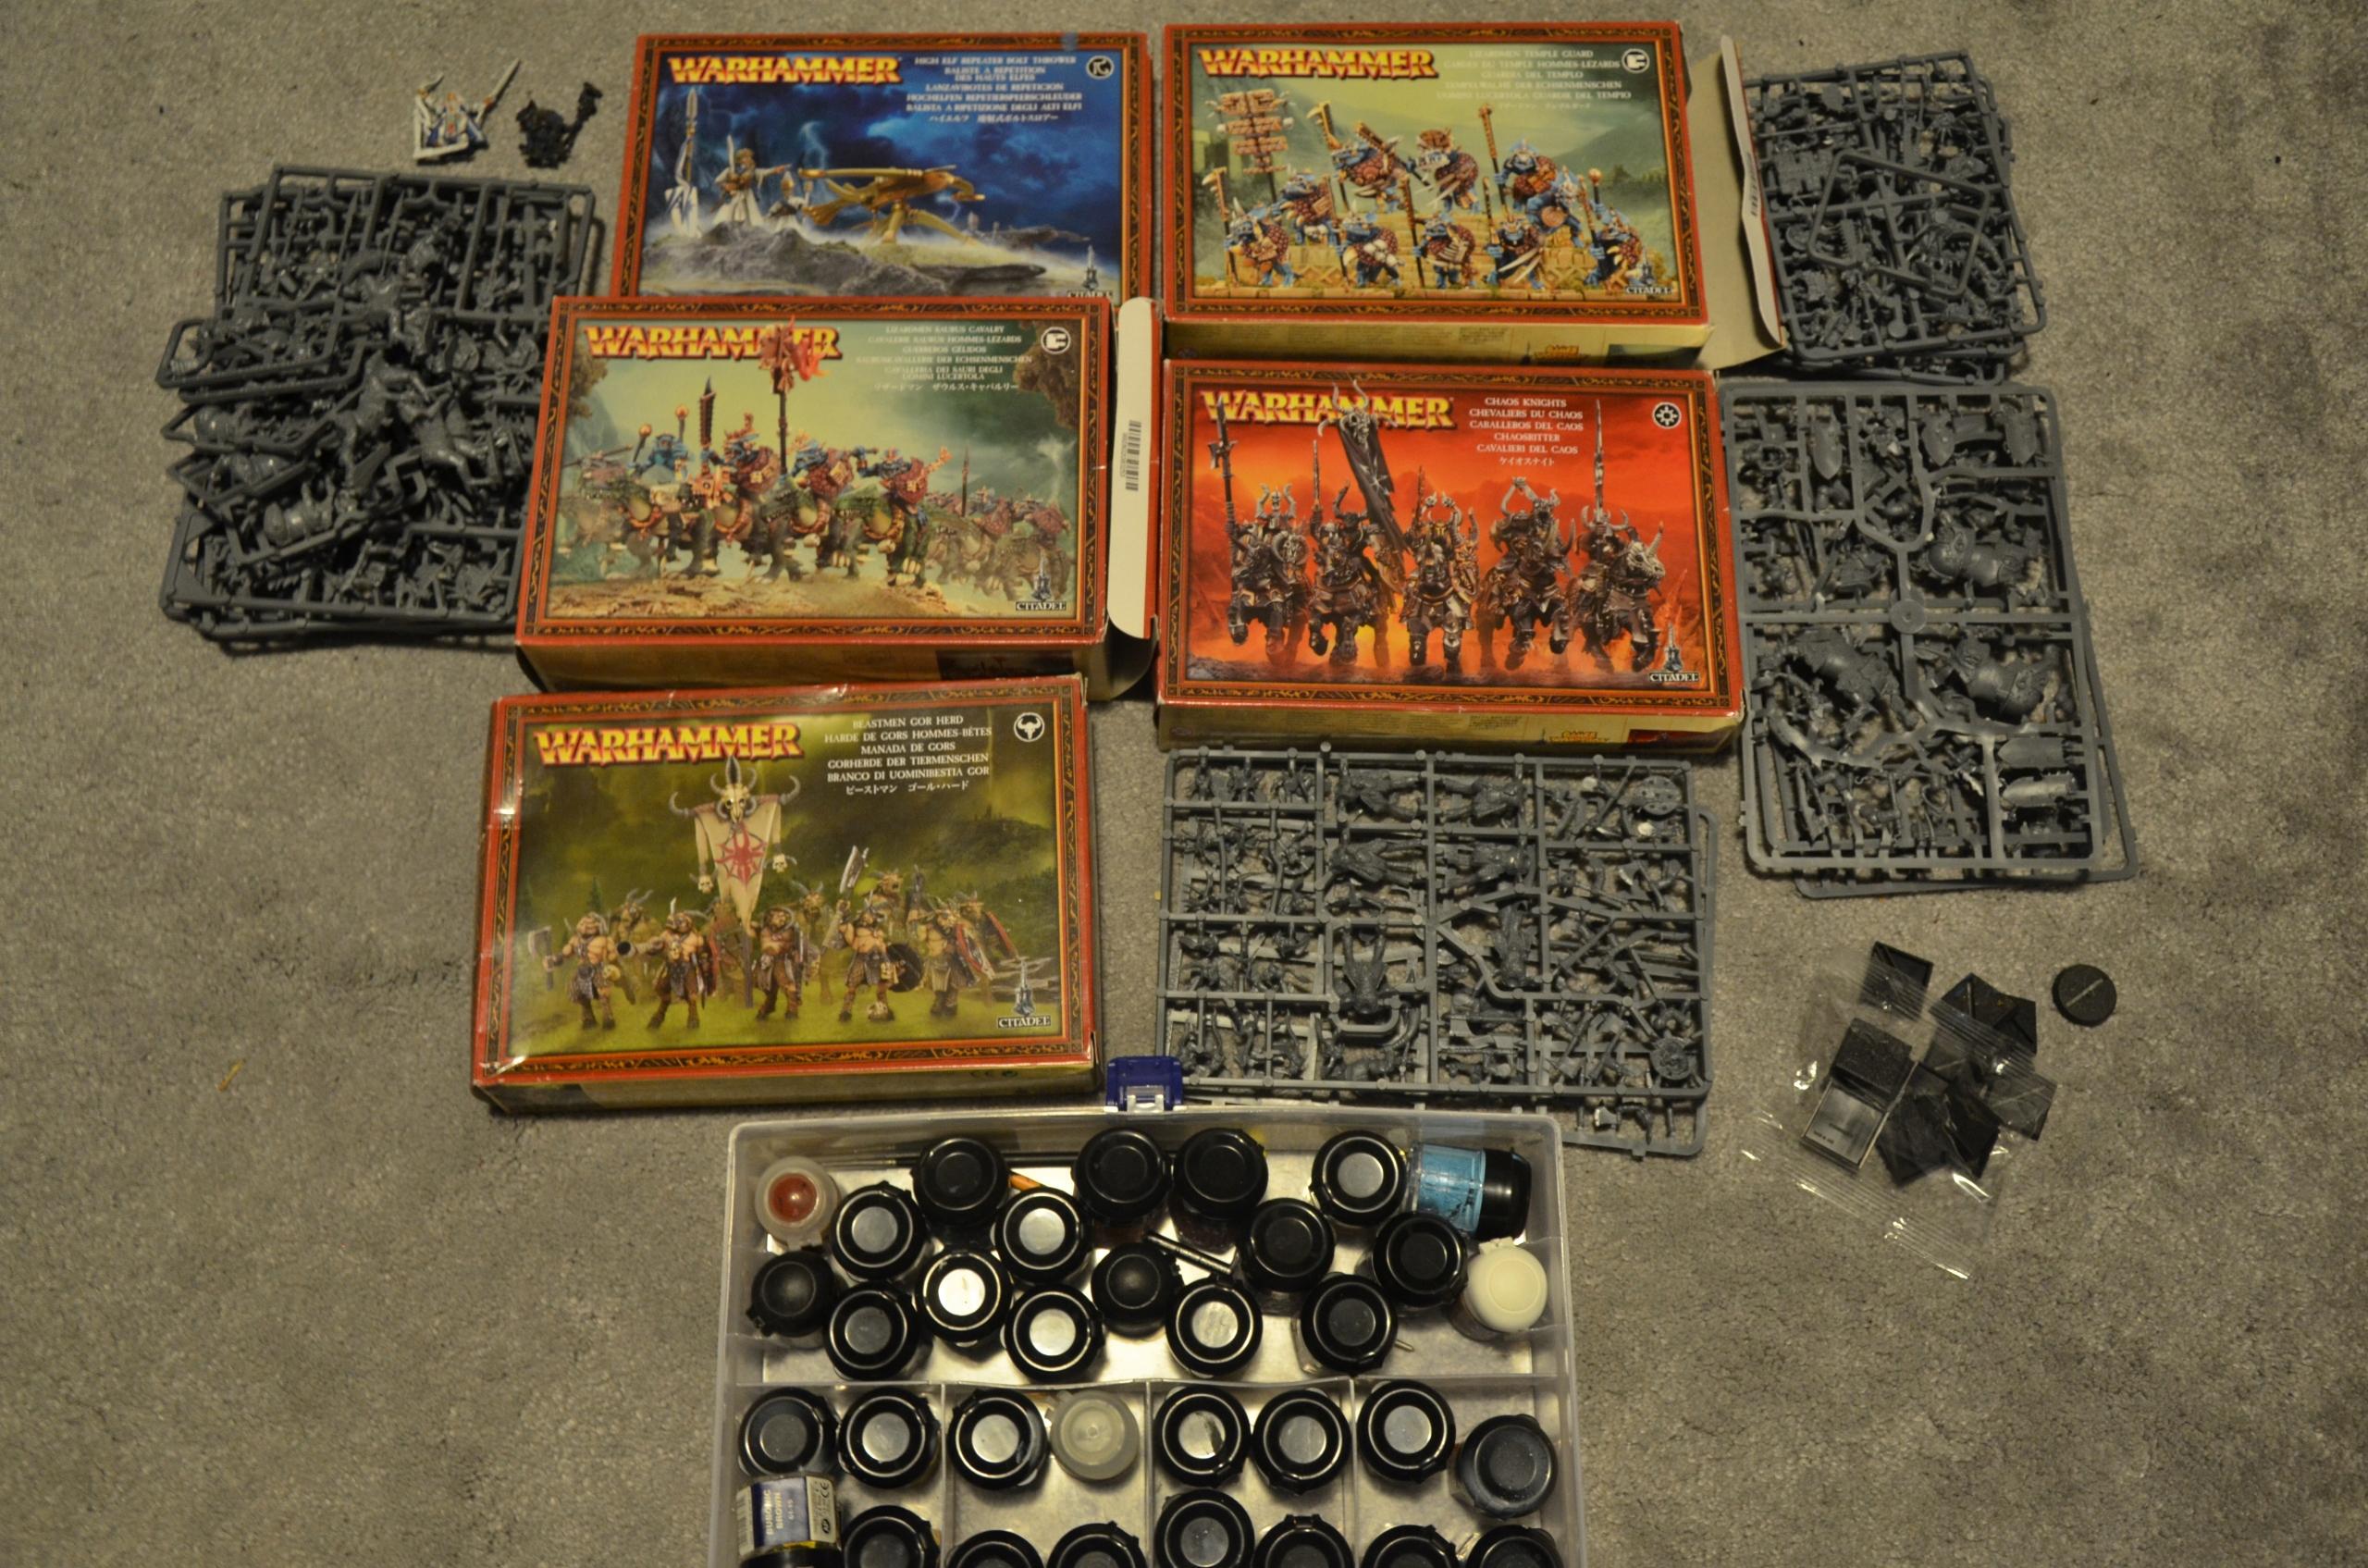 Warhammer FB - zestaw figurek, farbek - okazja!